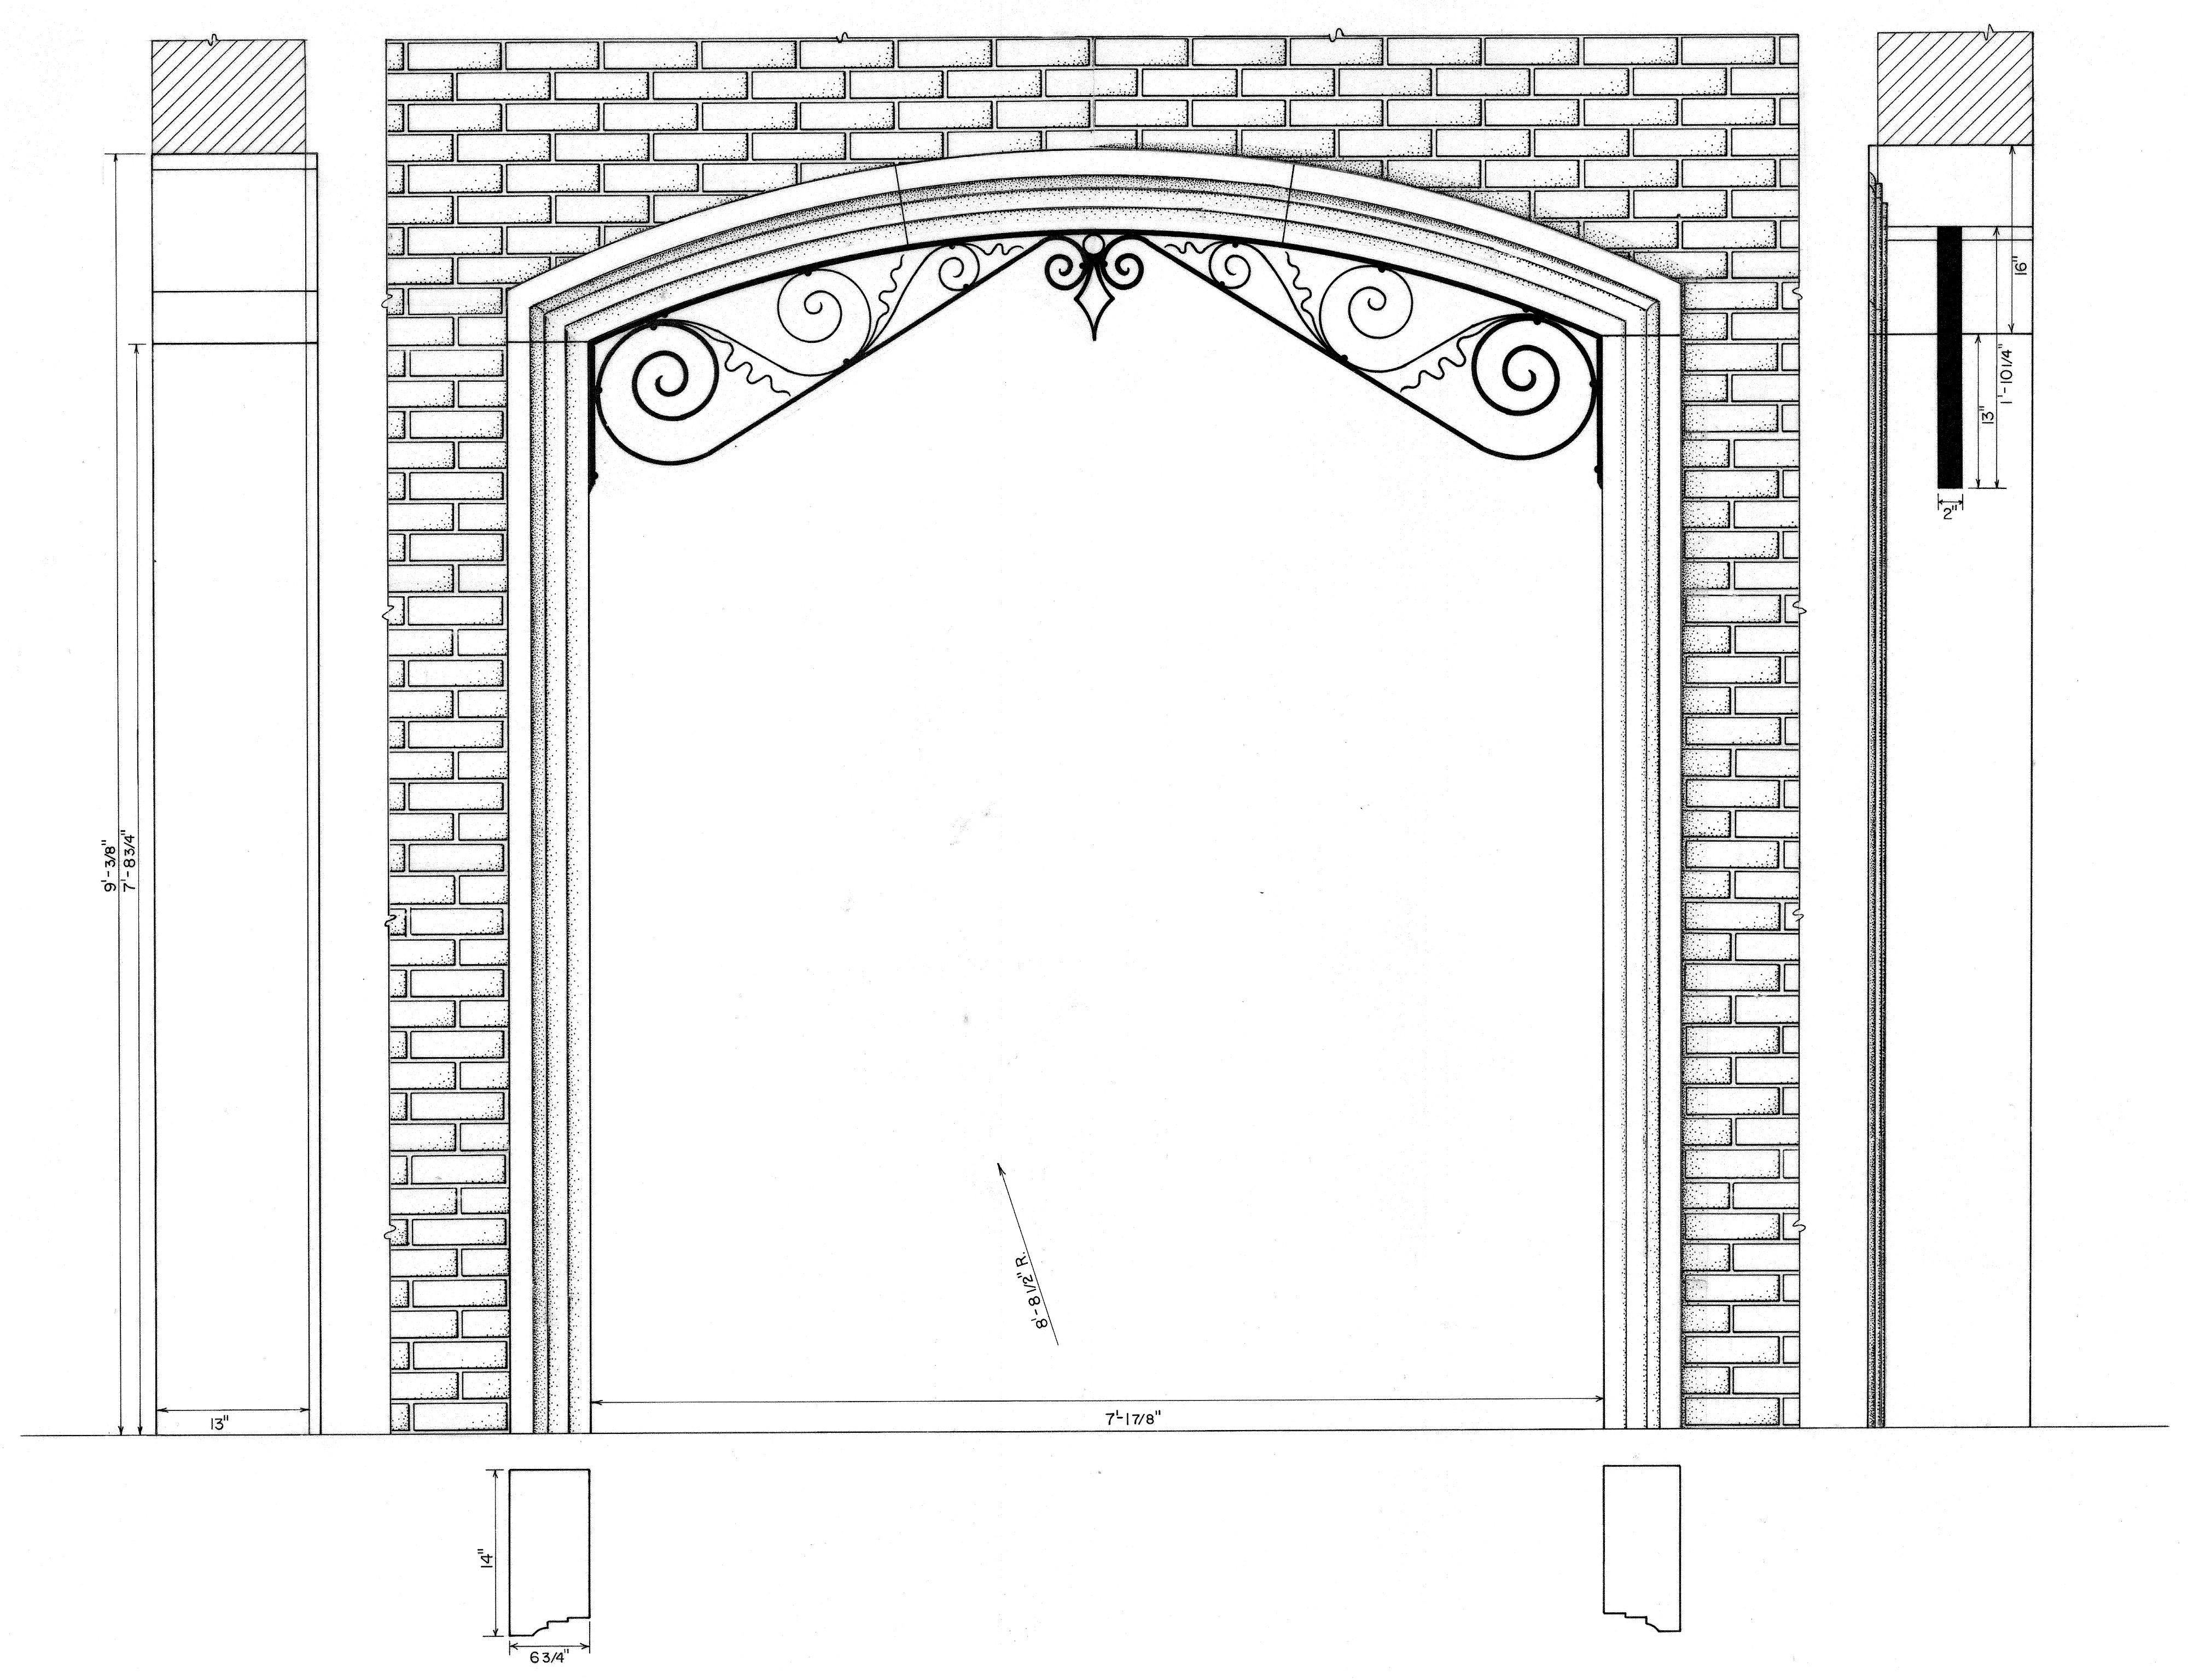 McPherson arches 3943